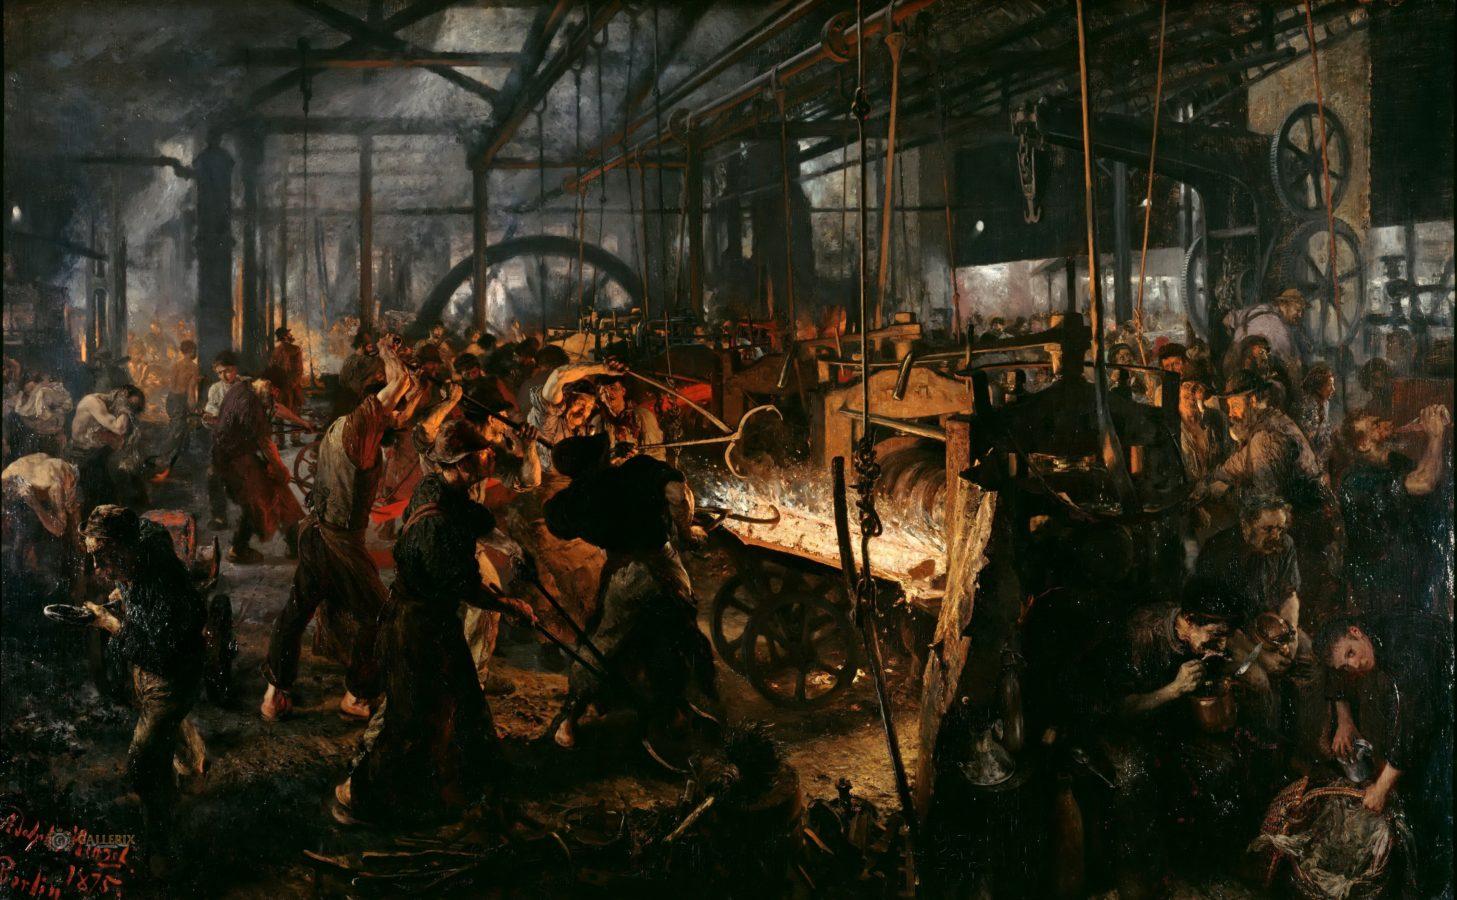 Adolf Menzel, The Rolling Iron Mill (Modern Cyclops), 1872-1875, oil on canvas, Nationalgalerie, Staatliche Museen zu Berlin.